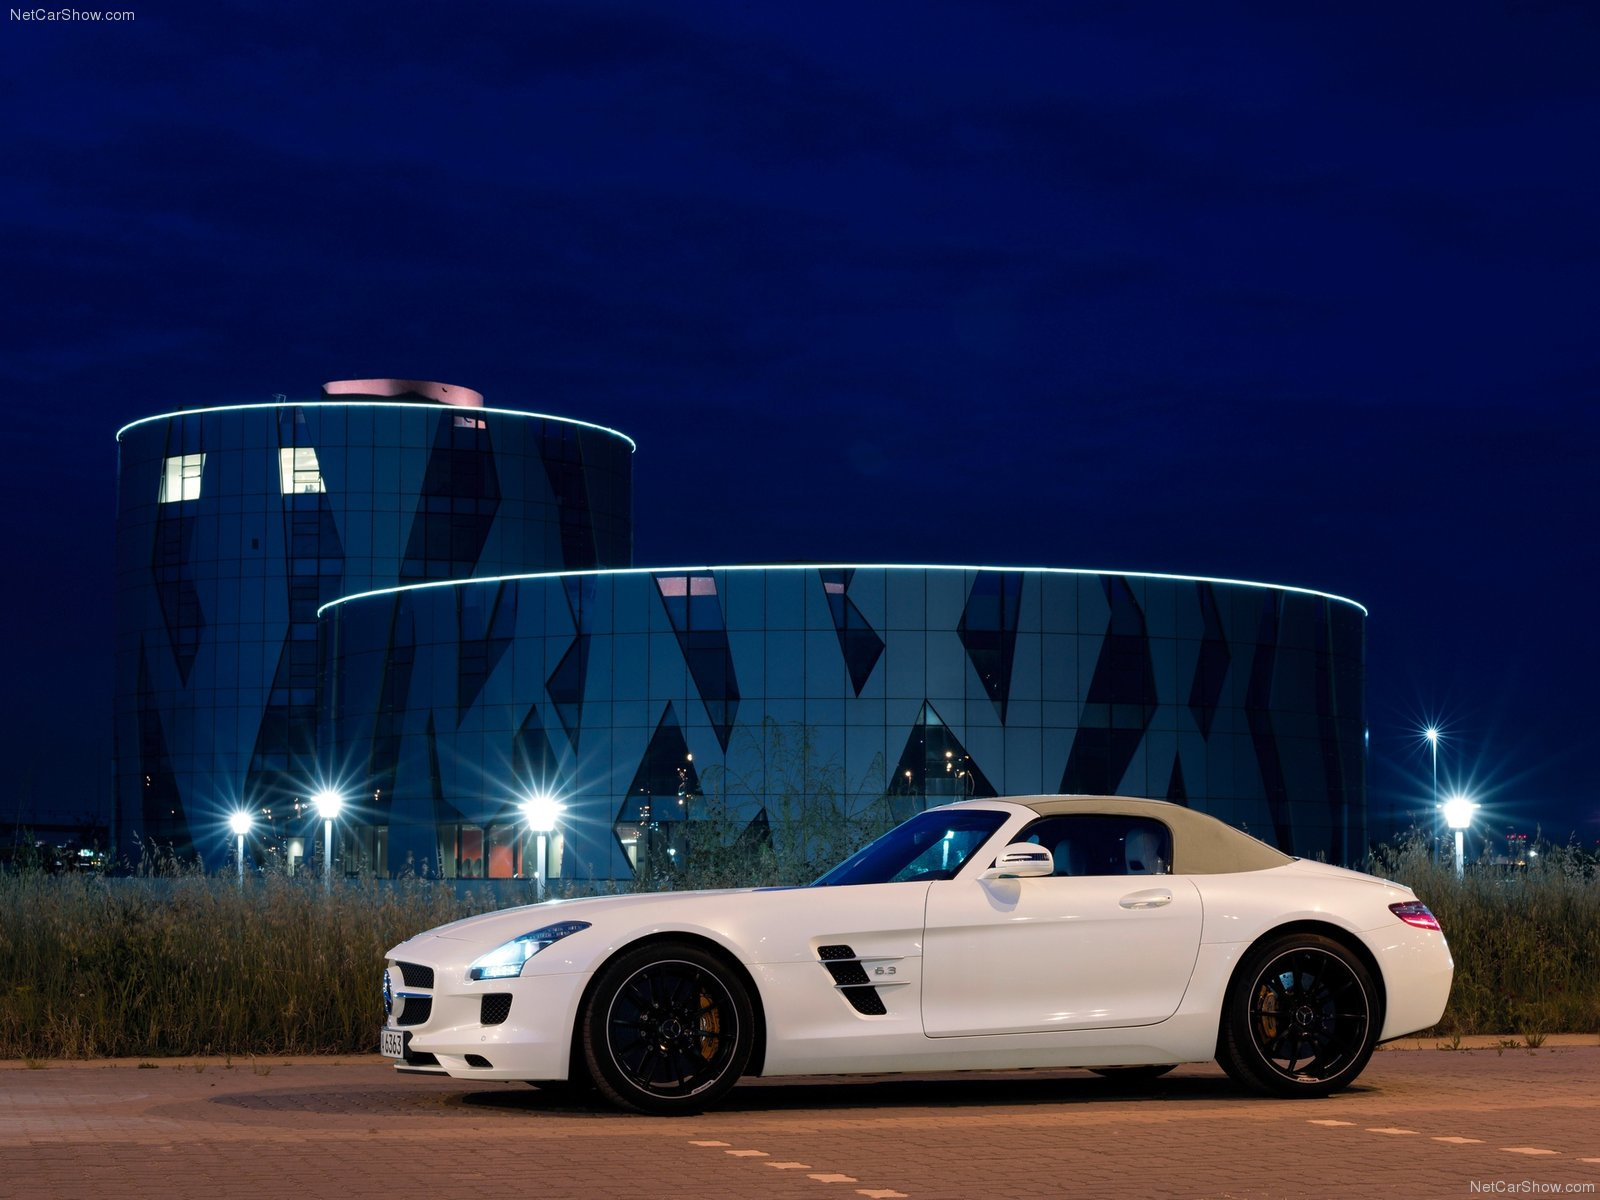 http://2.bp.blogspot.com/-YGSpsSryDBc/TeIdHKAZVAI/AAAAAAAAA8w/fIDZzTXJQZY/s1600/Mercedes-Benz-SLS_AMG_Roadster_2012_1600x1200_wallpaper_0c.jpg